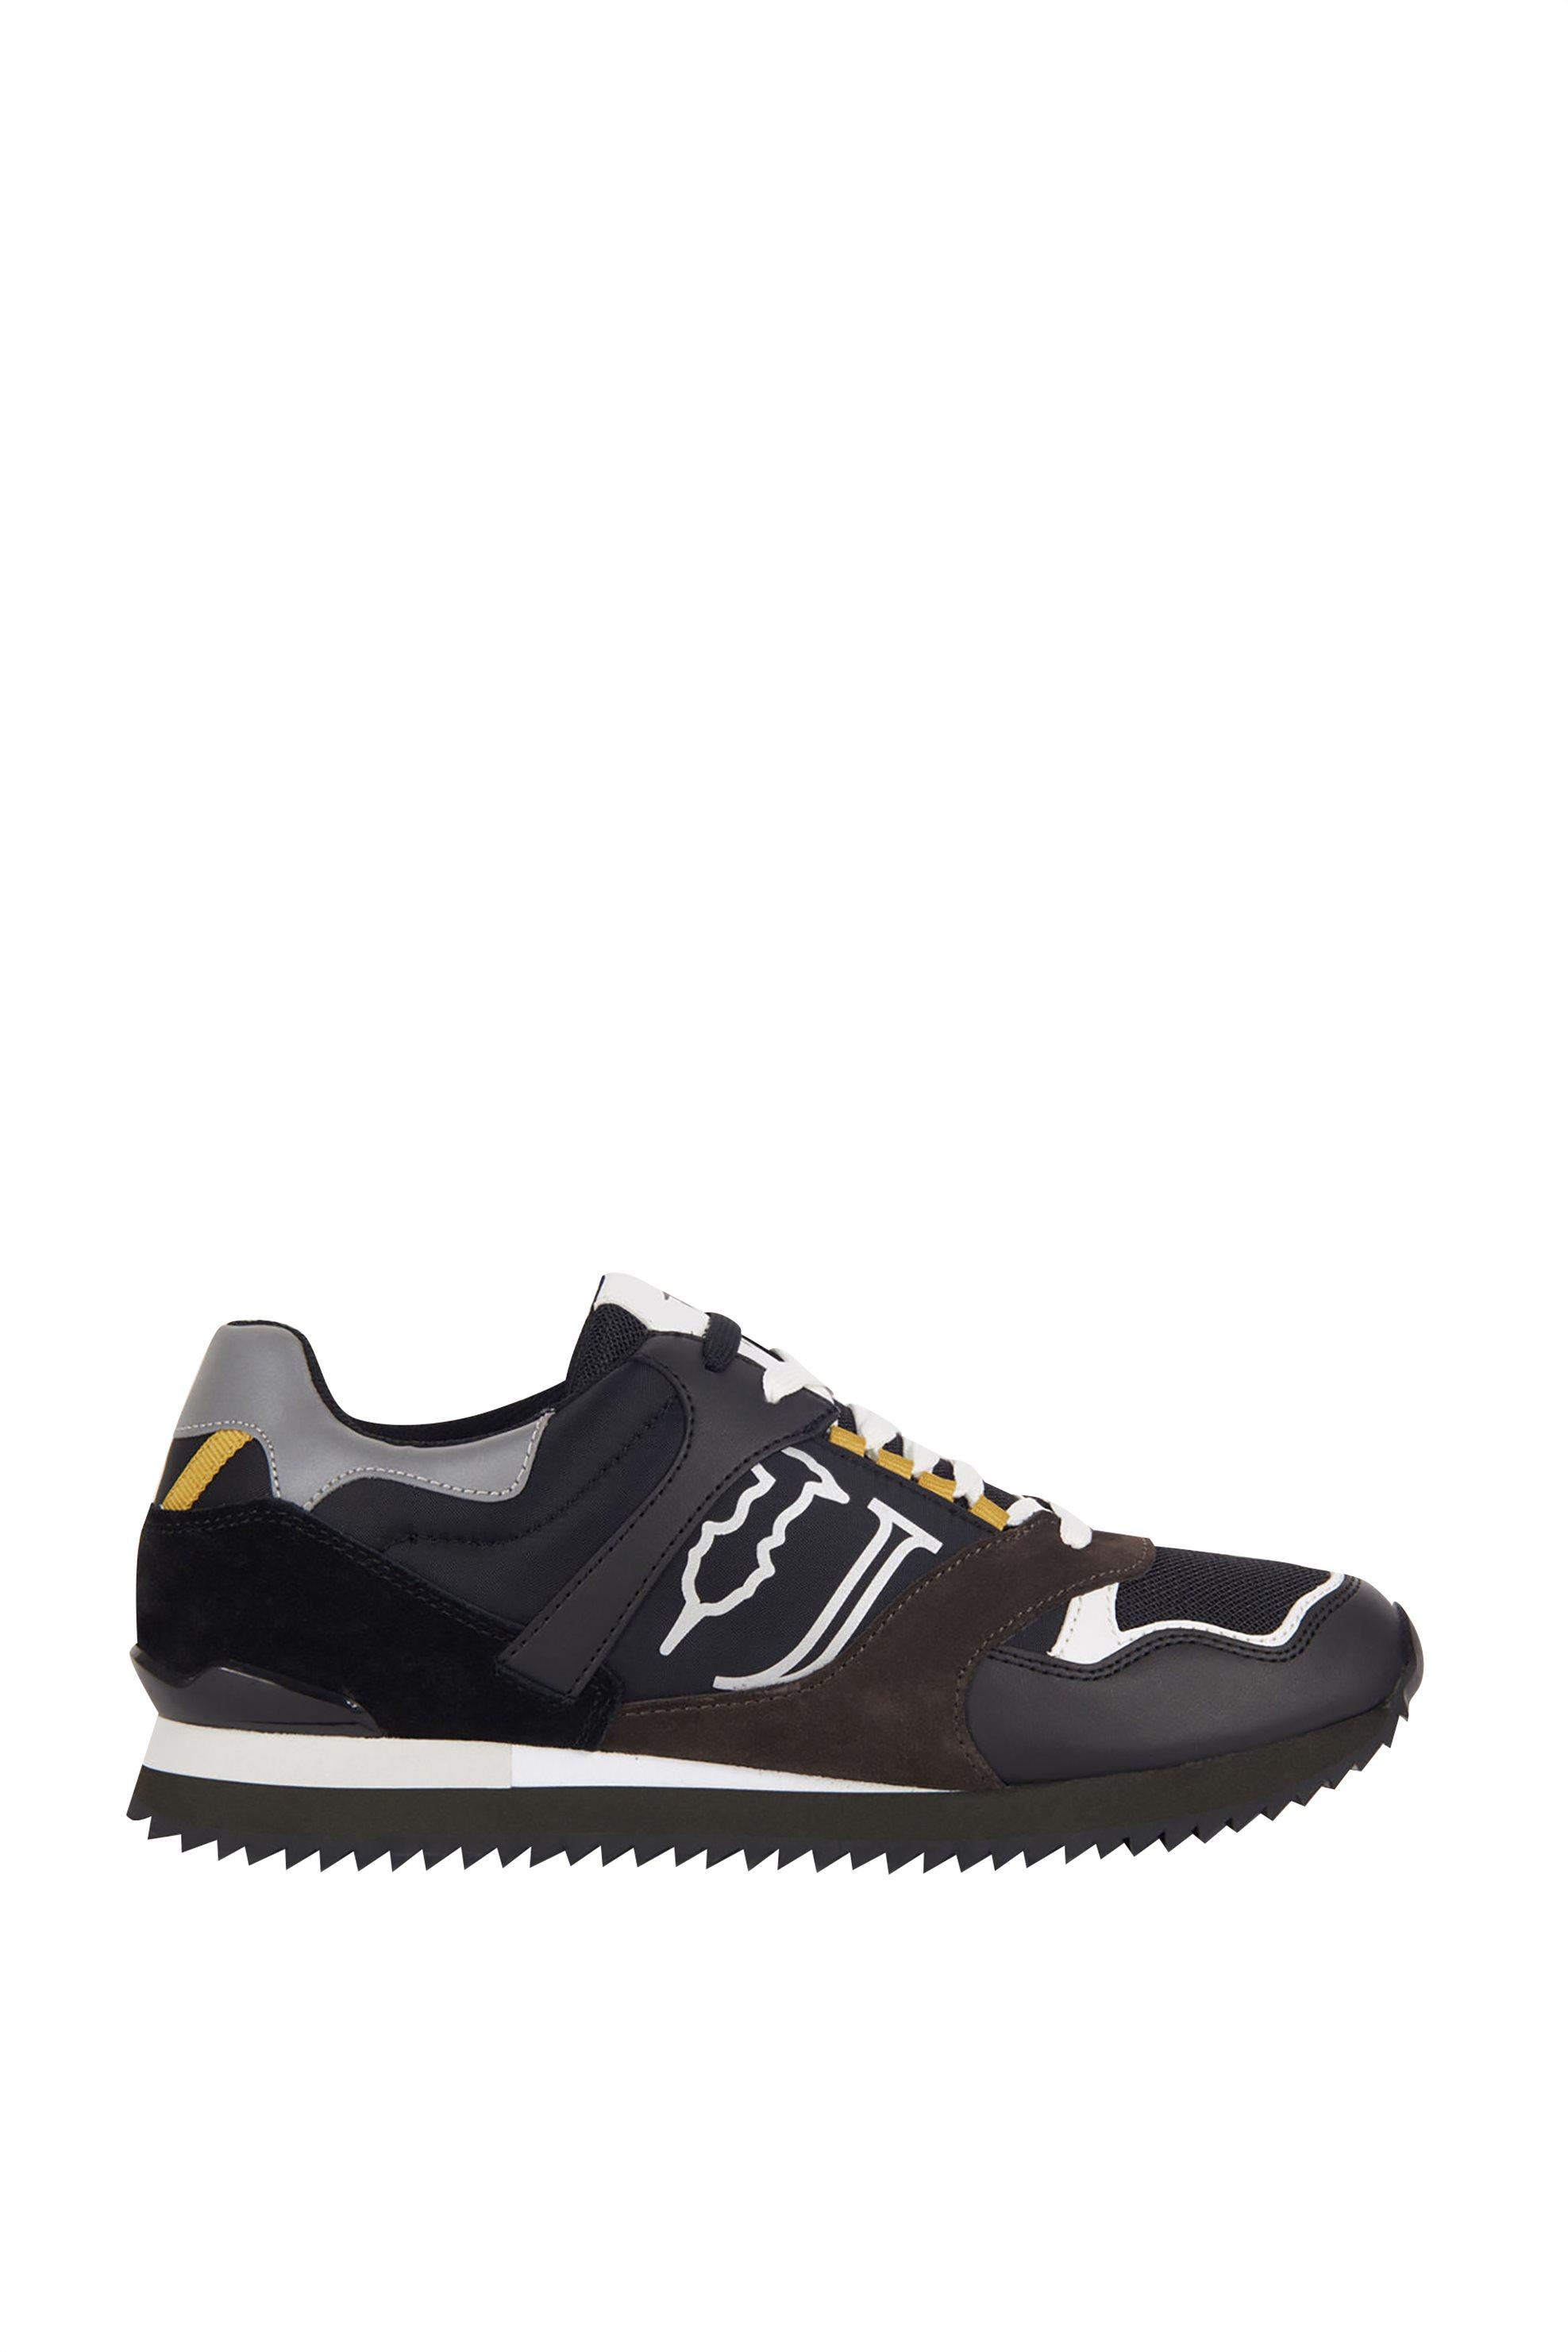 Trussardi Jeans ανδρικά sneakers με suede λεπτομέρειες – 77A00187-9Y099999 – Χακί